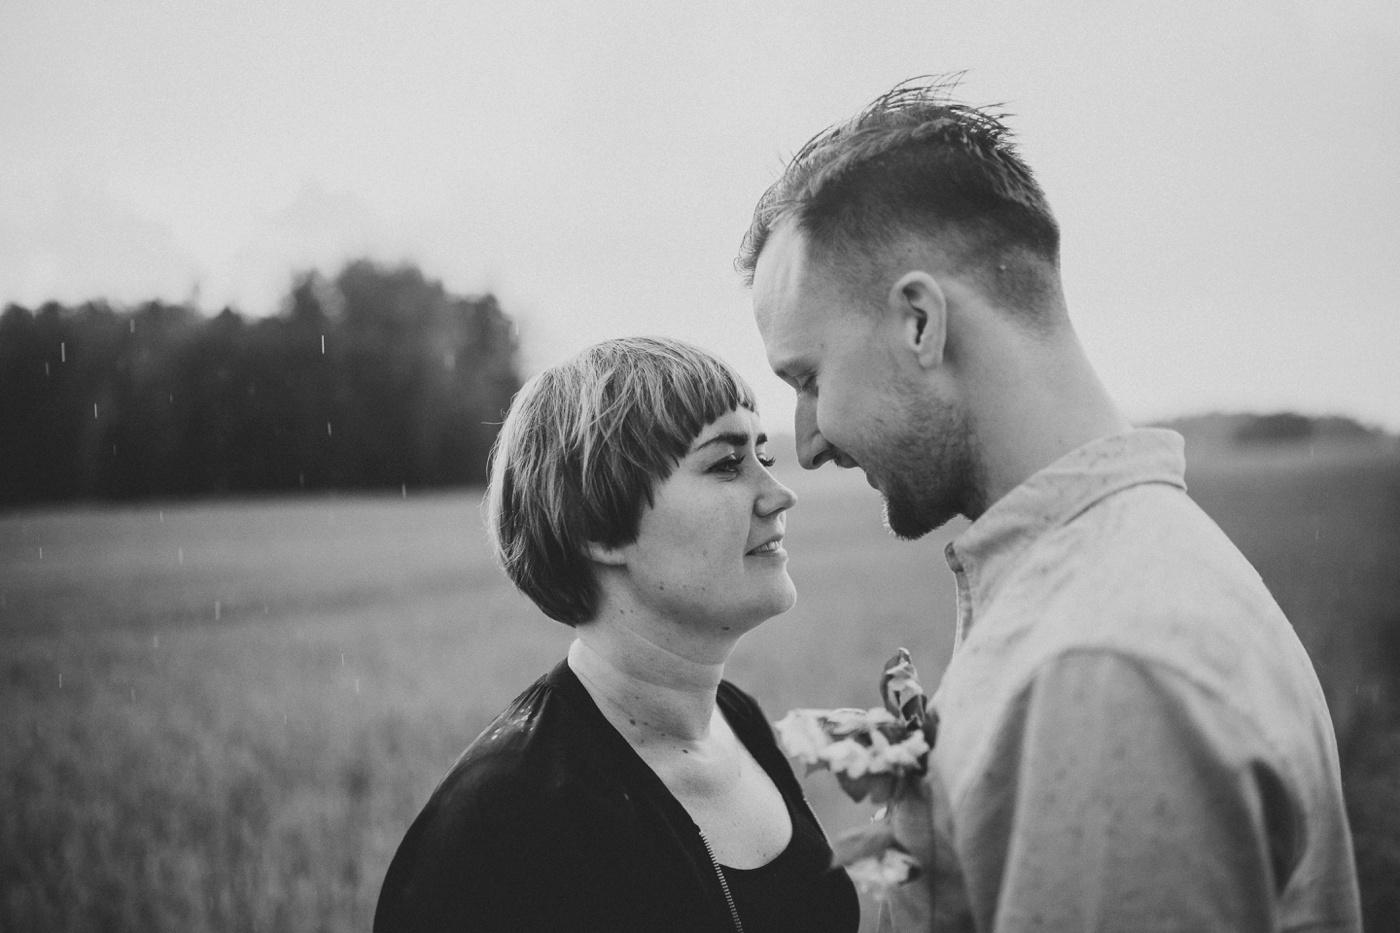 Gustav-Lisa-Relaxed-Swedish-Couples-Session_14